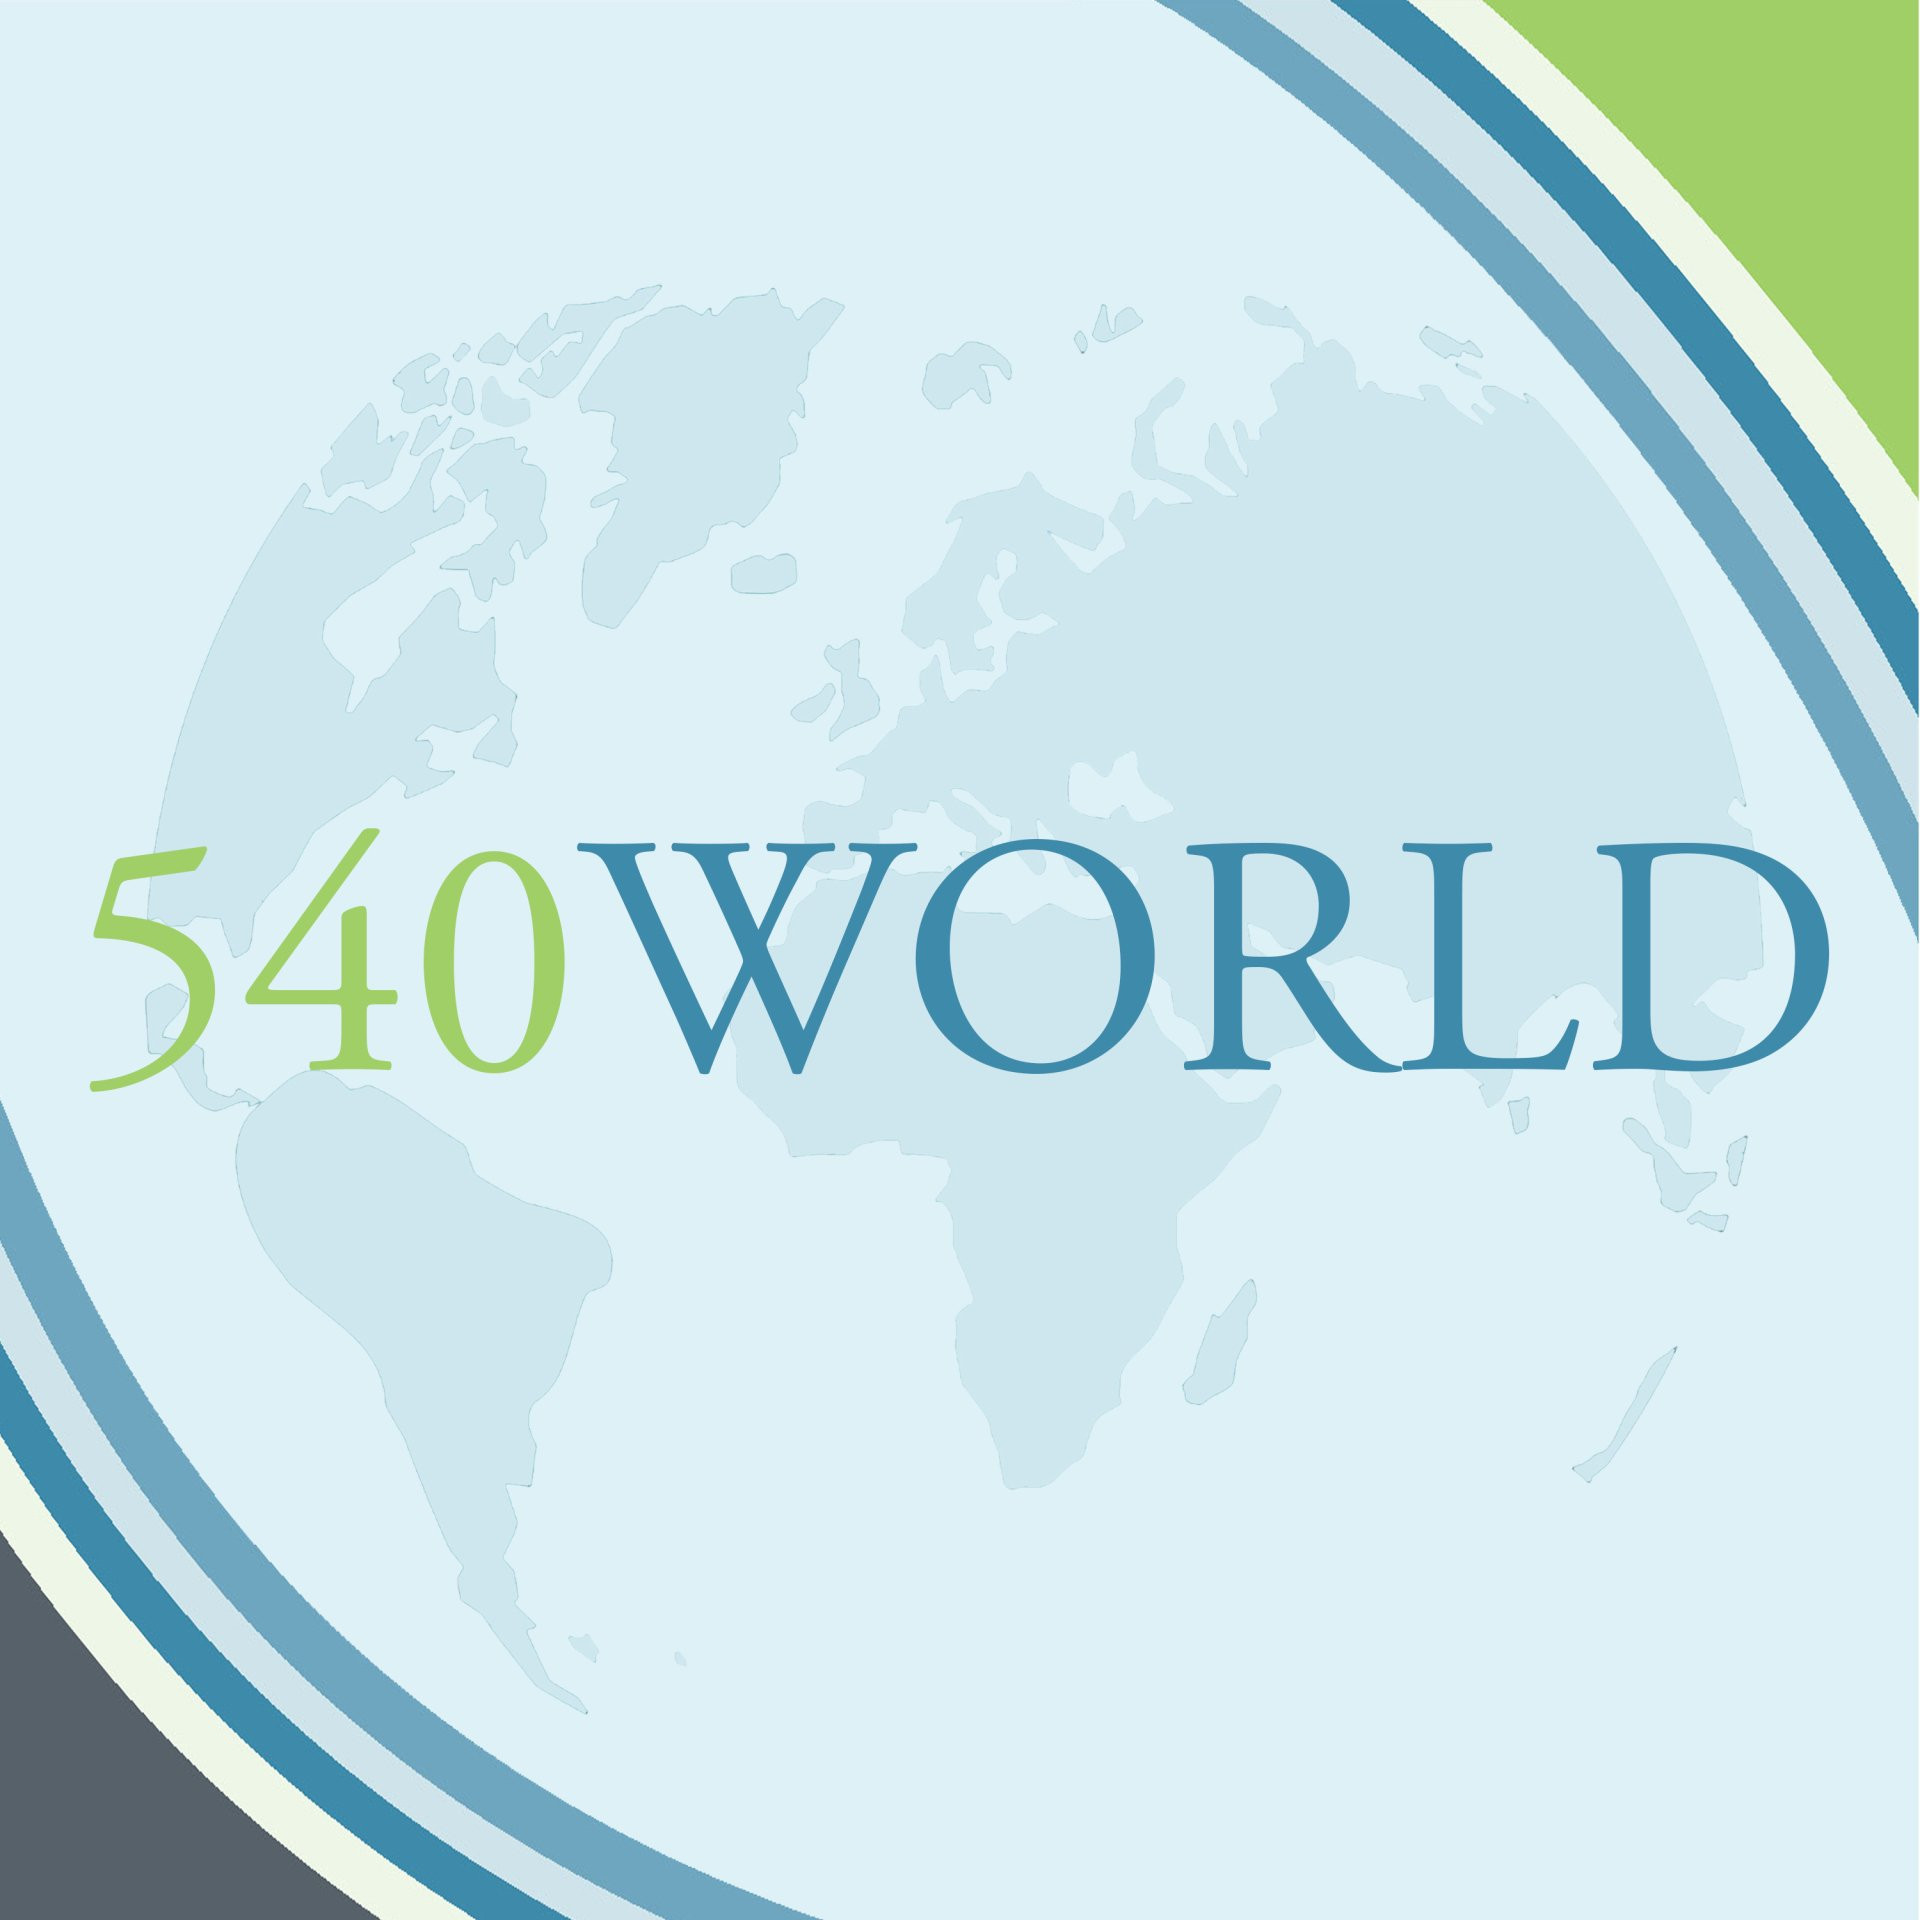 540 WORLD